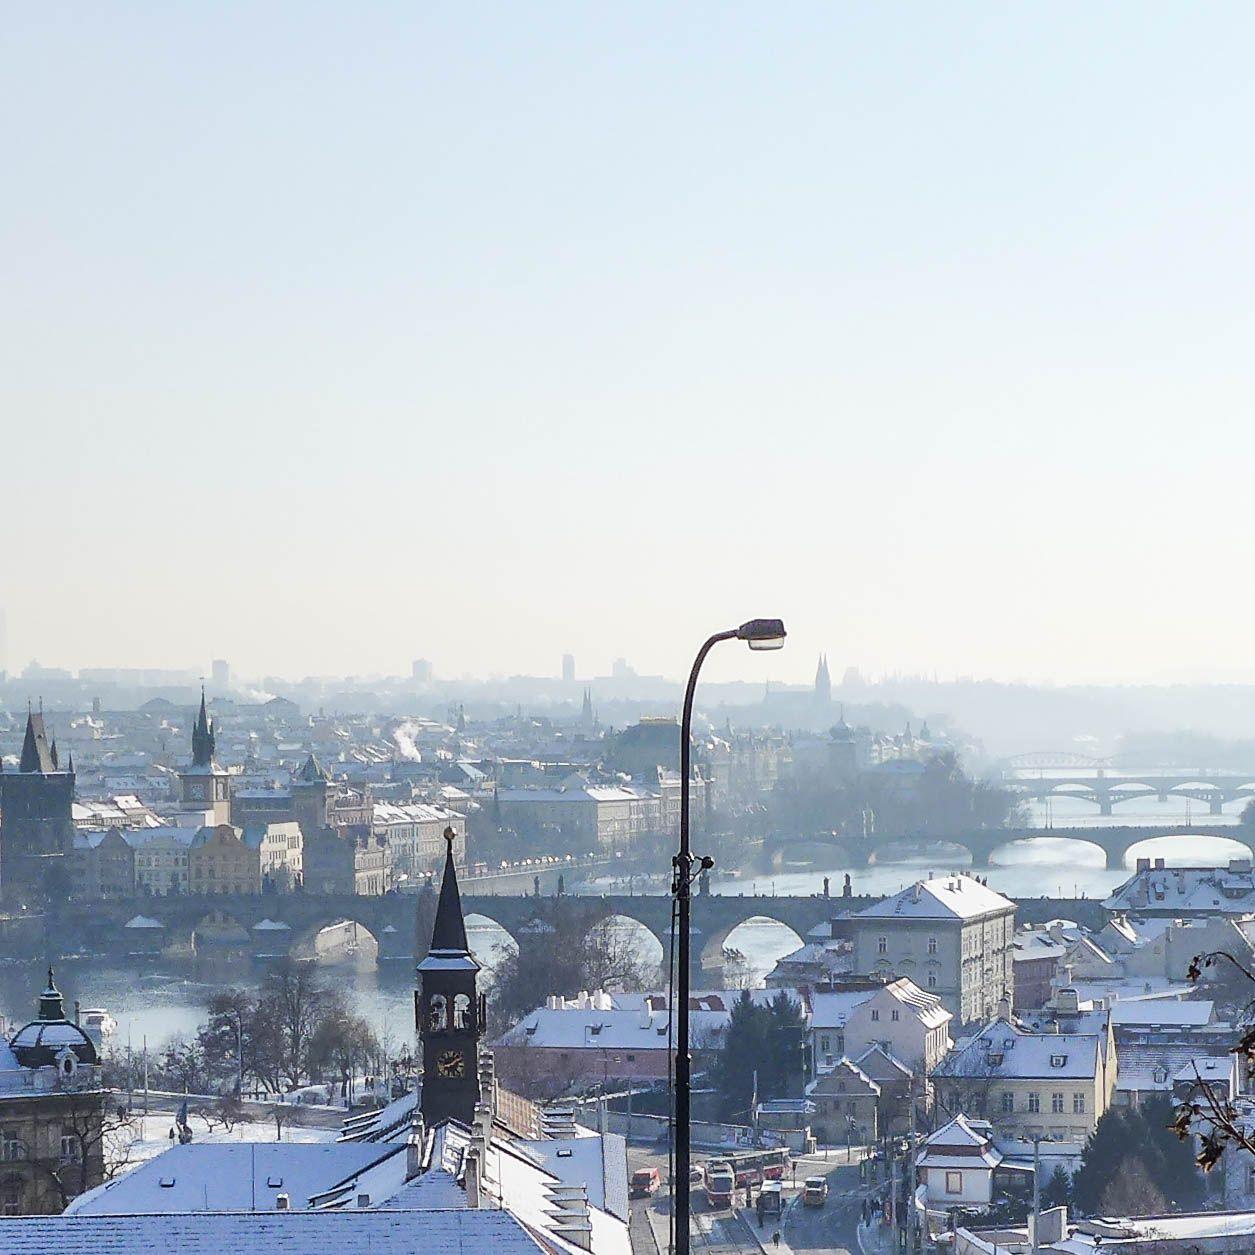 #prague #prag #praha #winter #snow #cold #moldau #moldavia #river #charlesbridge #karluvmost #karlsbrücke #bridge #bridges